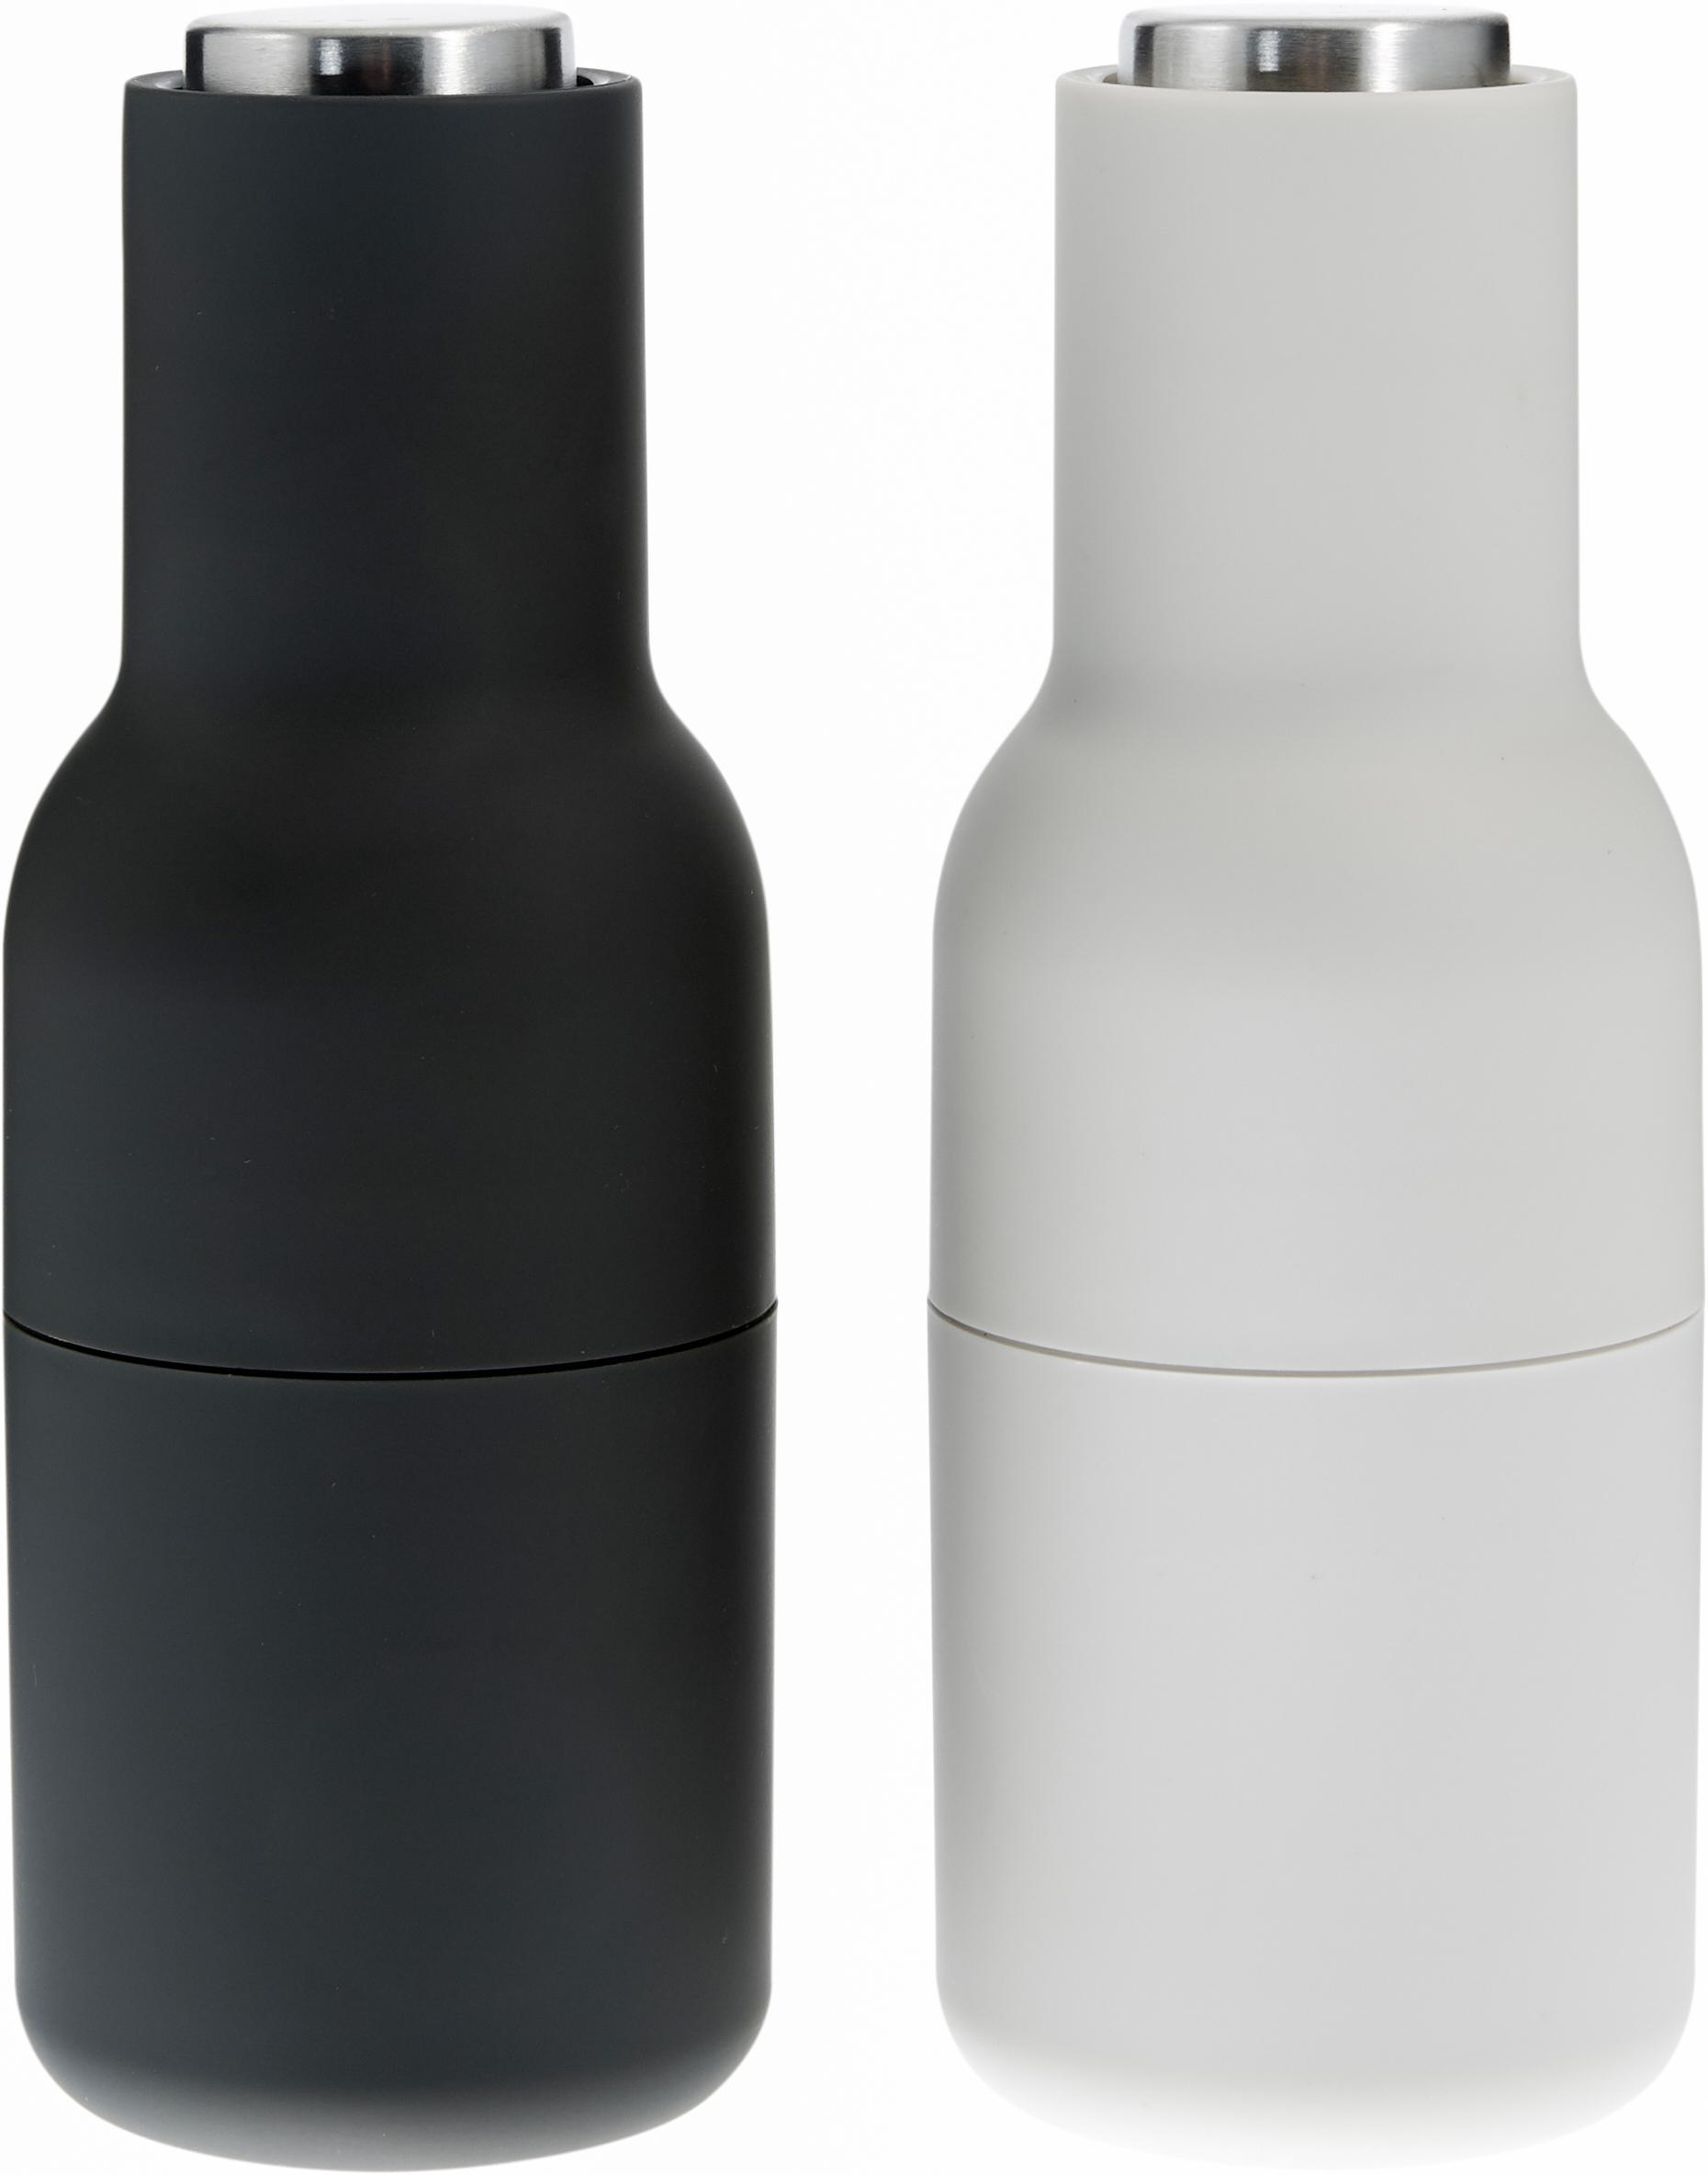 Designer Salz- & Pfeffermühle Bottle Grinder mit Edelstahldeckel, Korpus: Kunststoff, Mahlwerk: Keramik, Deckel: Edelstahl, Anthrazit, Hellgrau, Ø 8 x H 21 cm